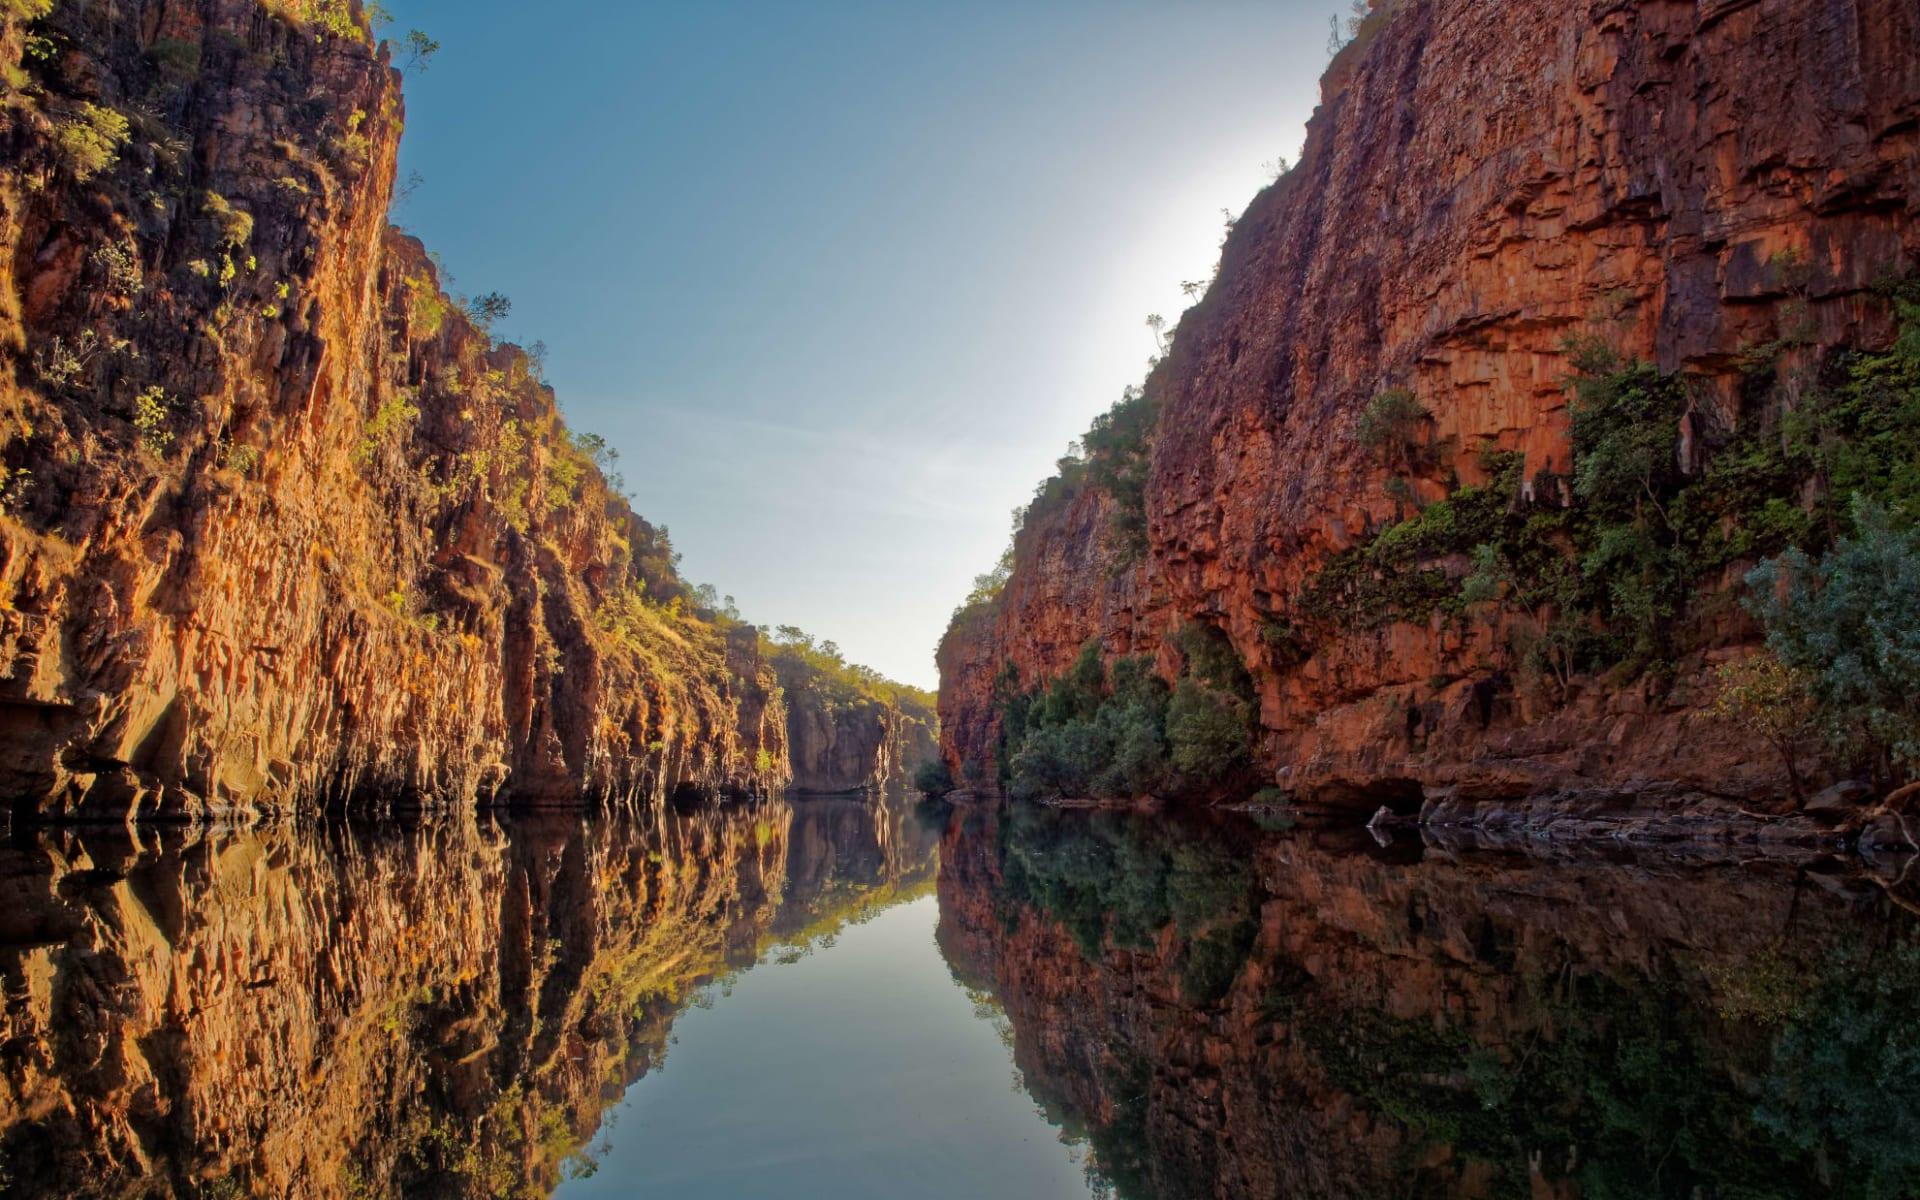 Kakadu, Katherine & Litchfield Adventure ab Darwin: Katherine Gorge im Nitmiluk National Park